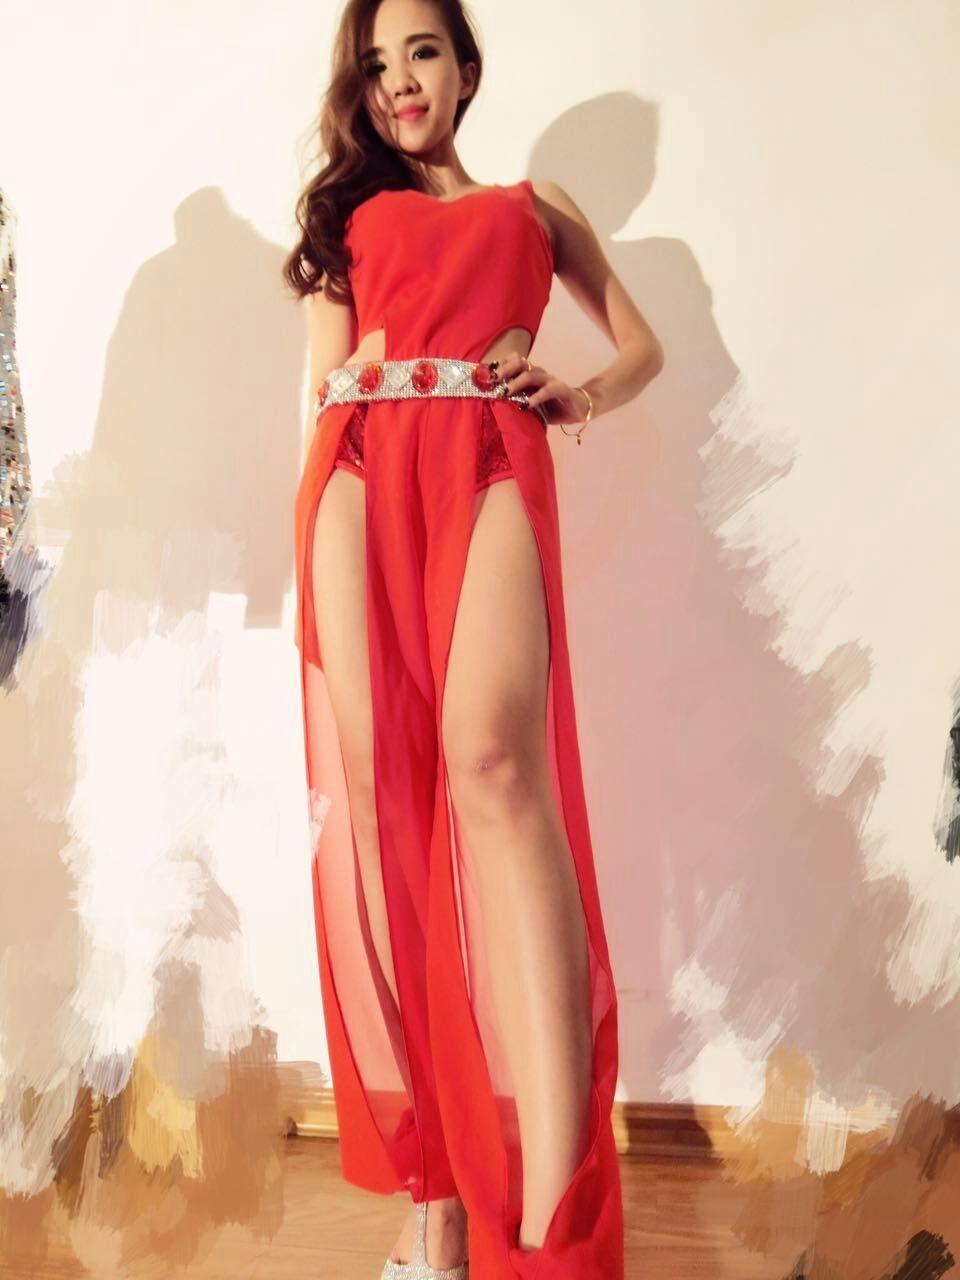 Aliexpress.com : Buy 2016 women sexy red rhinestone blet sequin jumpsuit  female singer DJ DS dance stage costume bodysuit nightclub show clothing  set from ... - Aliexpress.com : Buy 2016 Women Sexy Red Rhinestone Blet Sequin